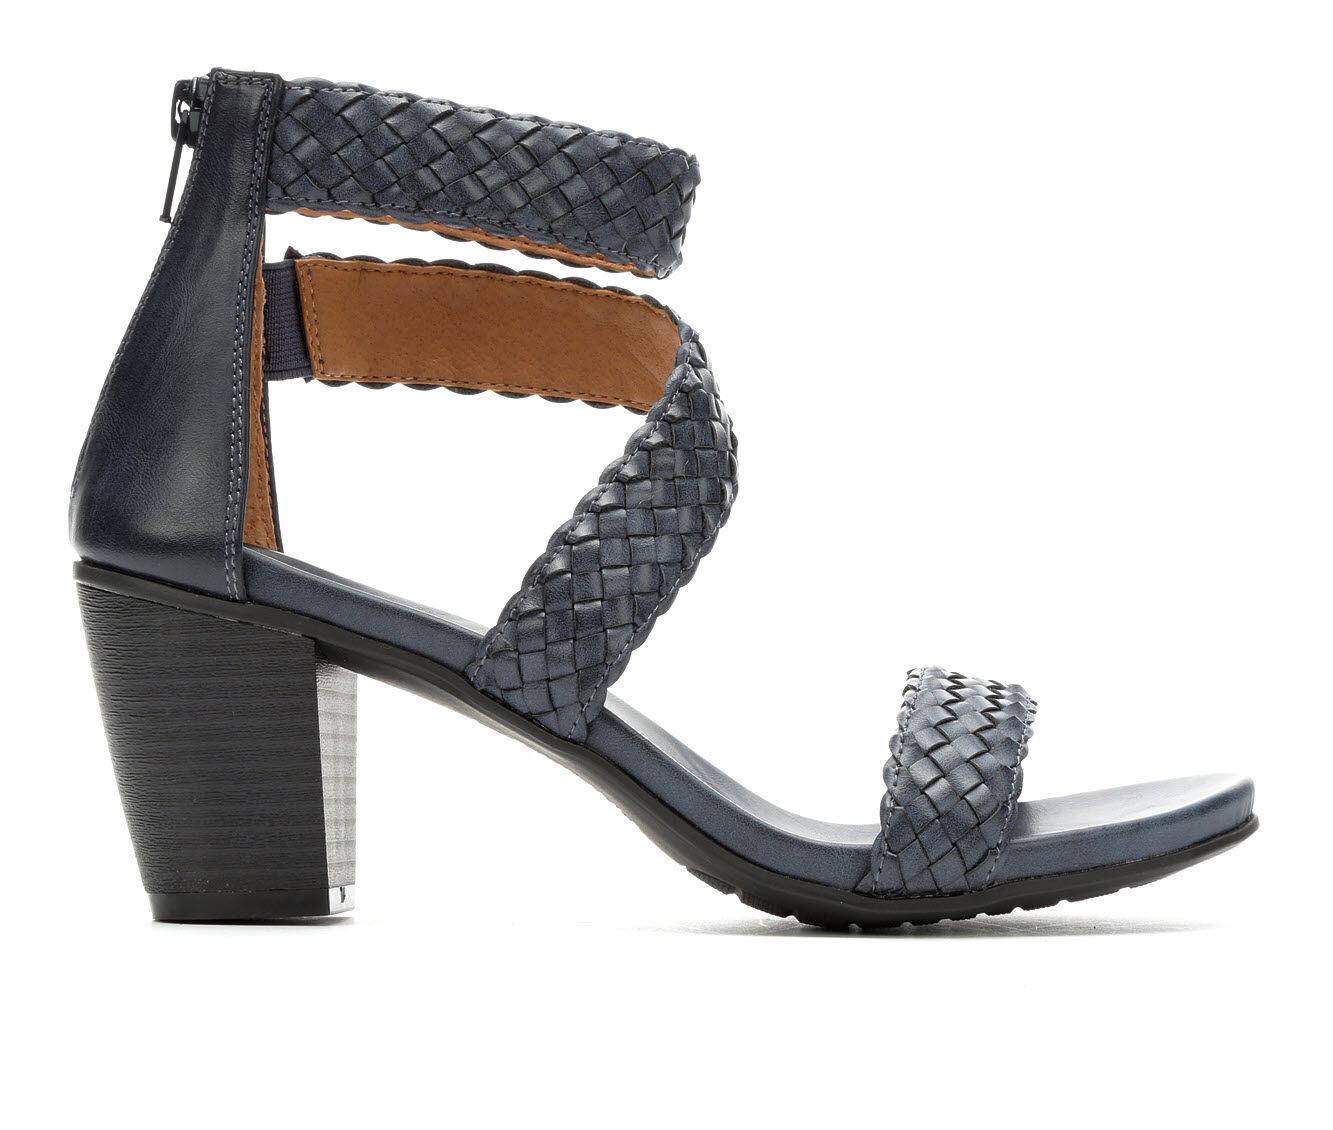 uk shoes_kd6243